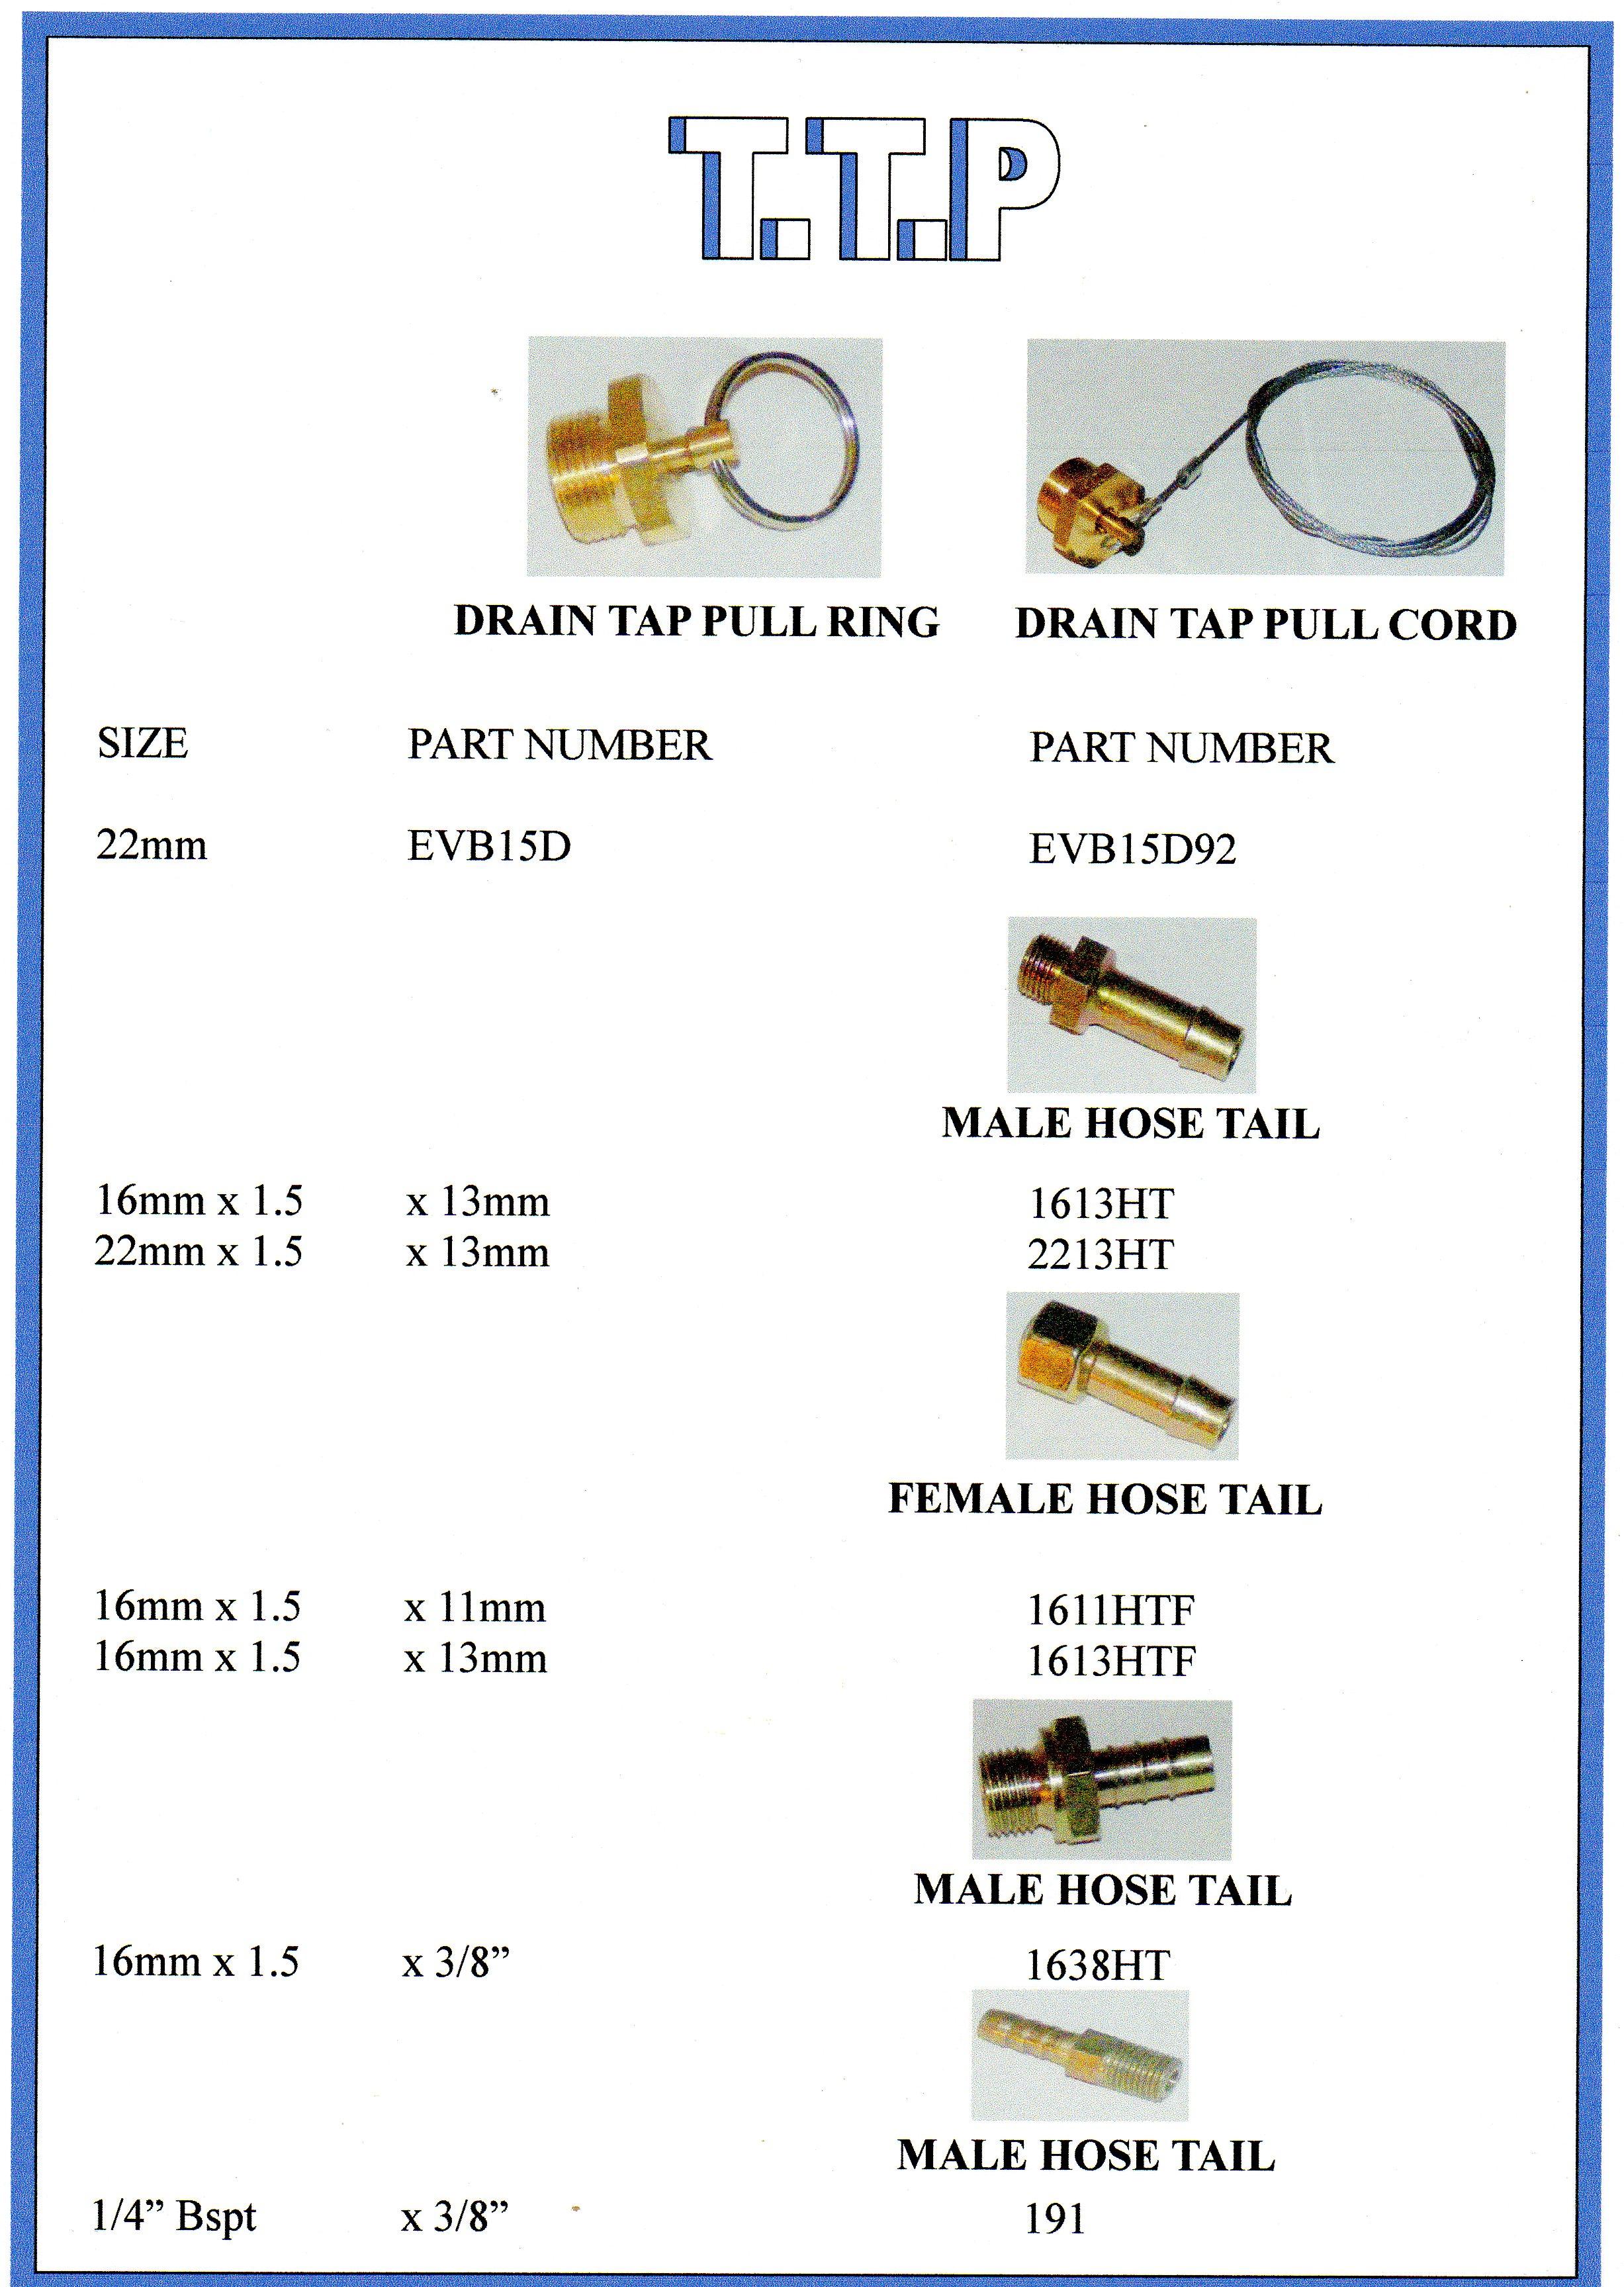 Truck & Trailer Drain Tap Pull Ring & Cord